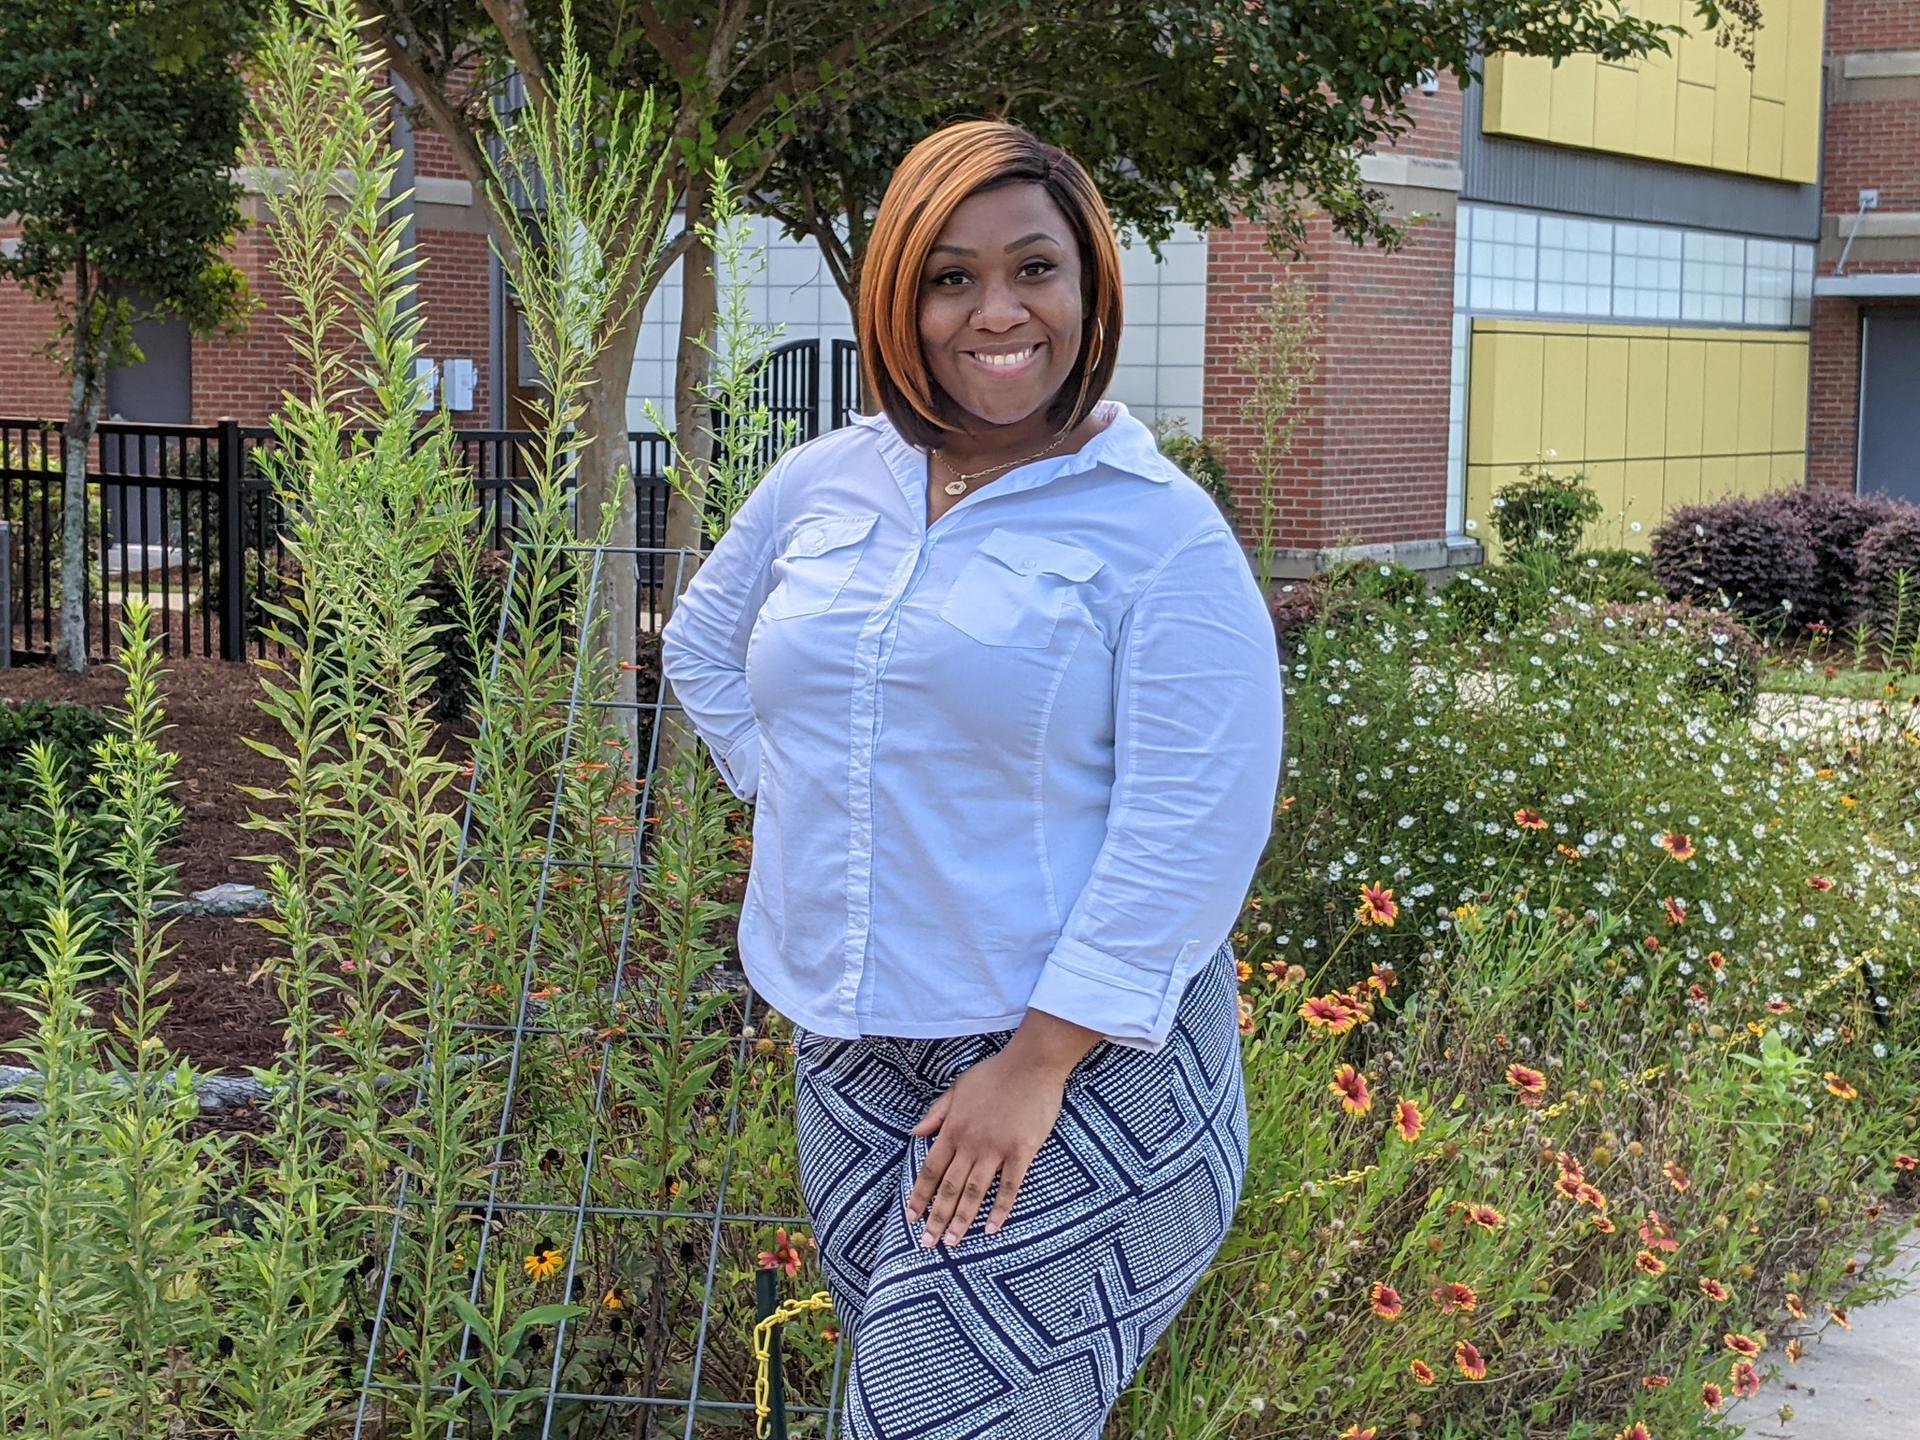 Ms. Christian